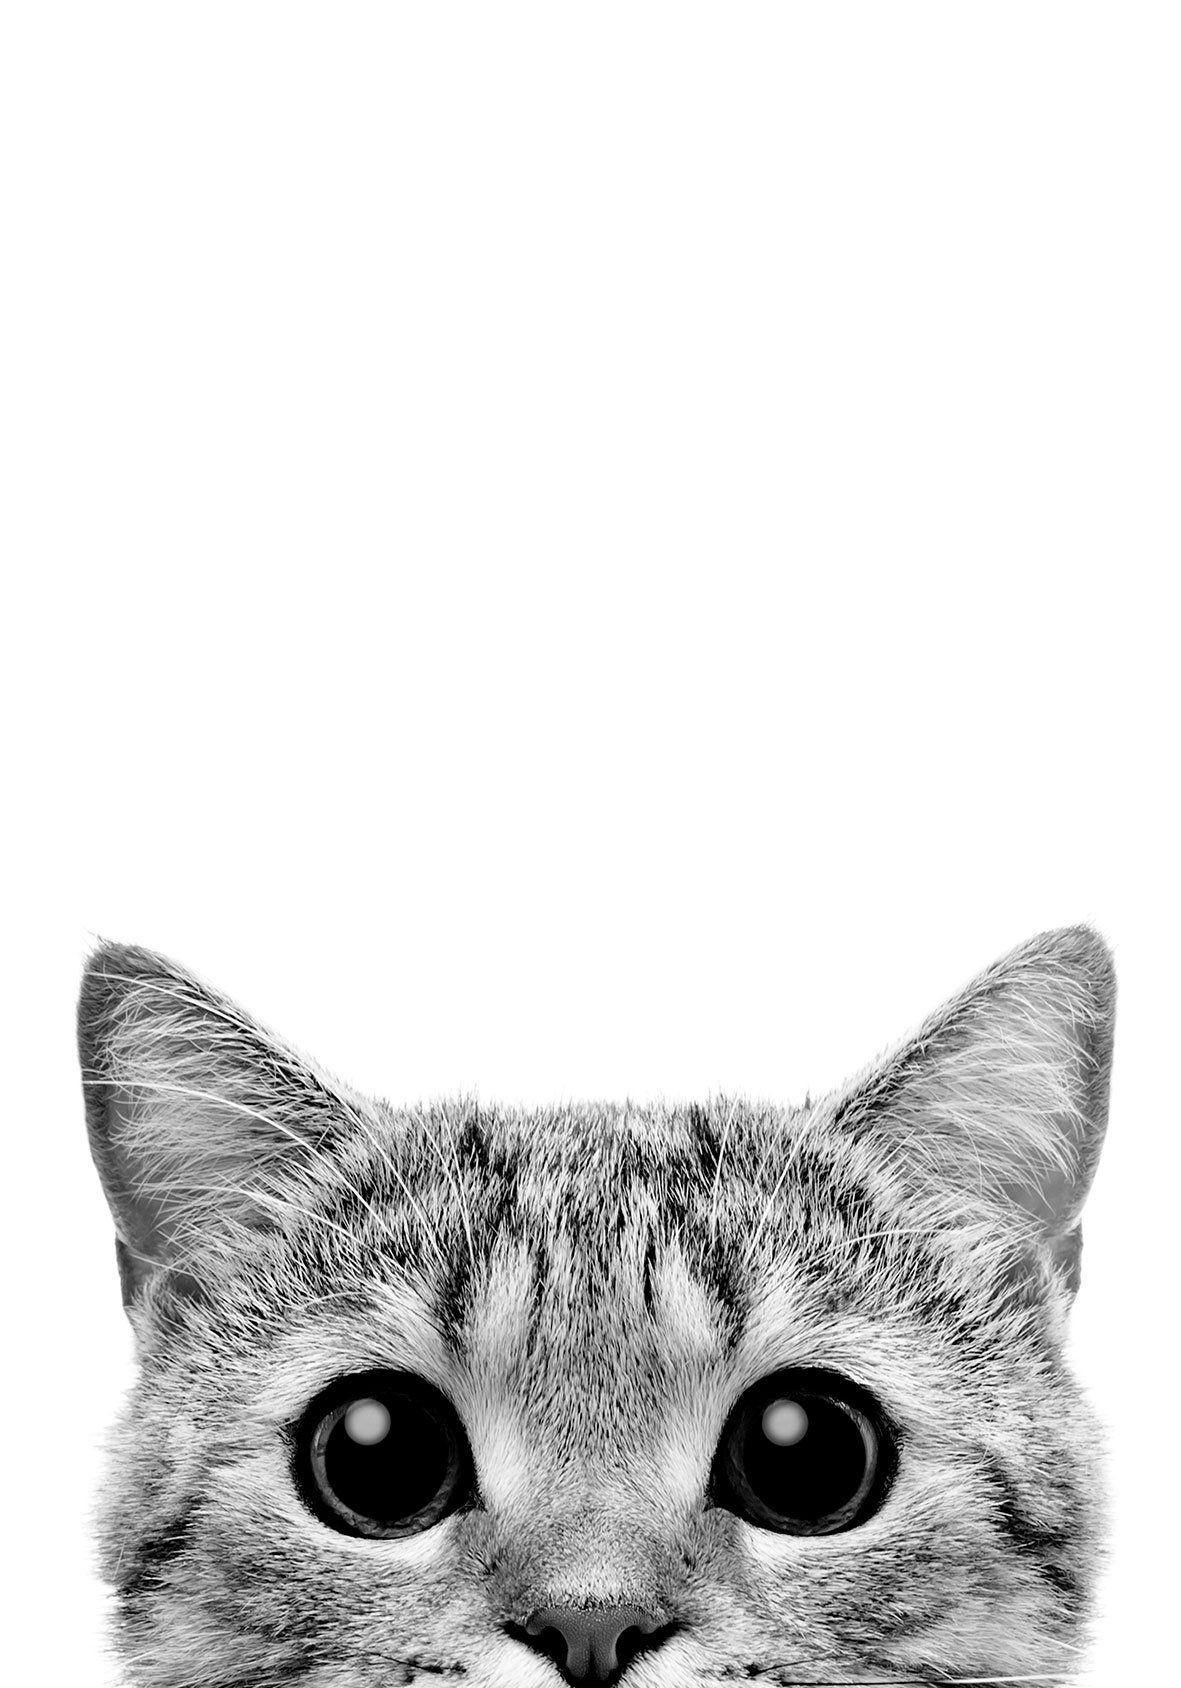 Kitty Peeks Printable Poster Black And White Minimalist Modern